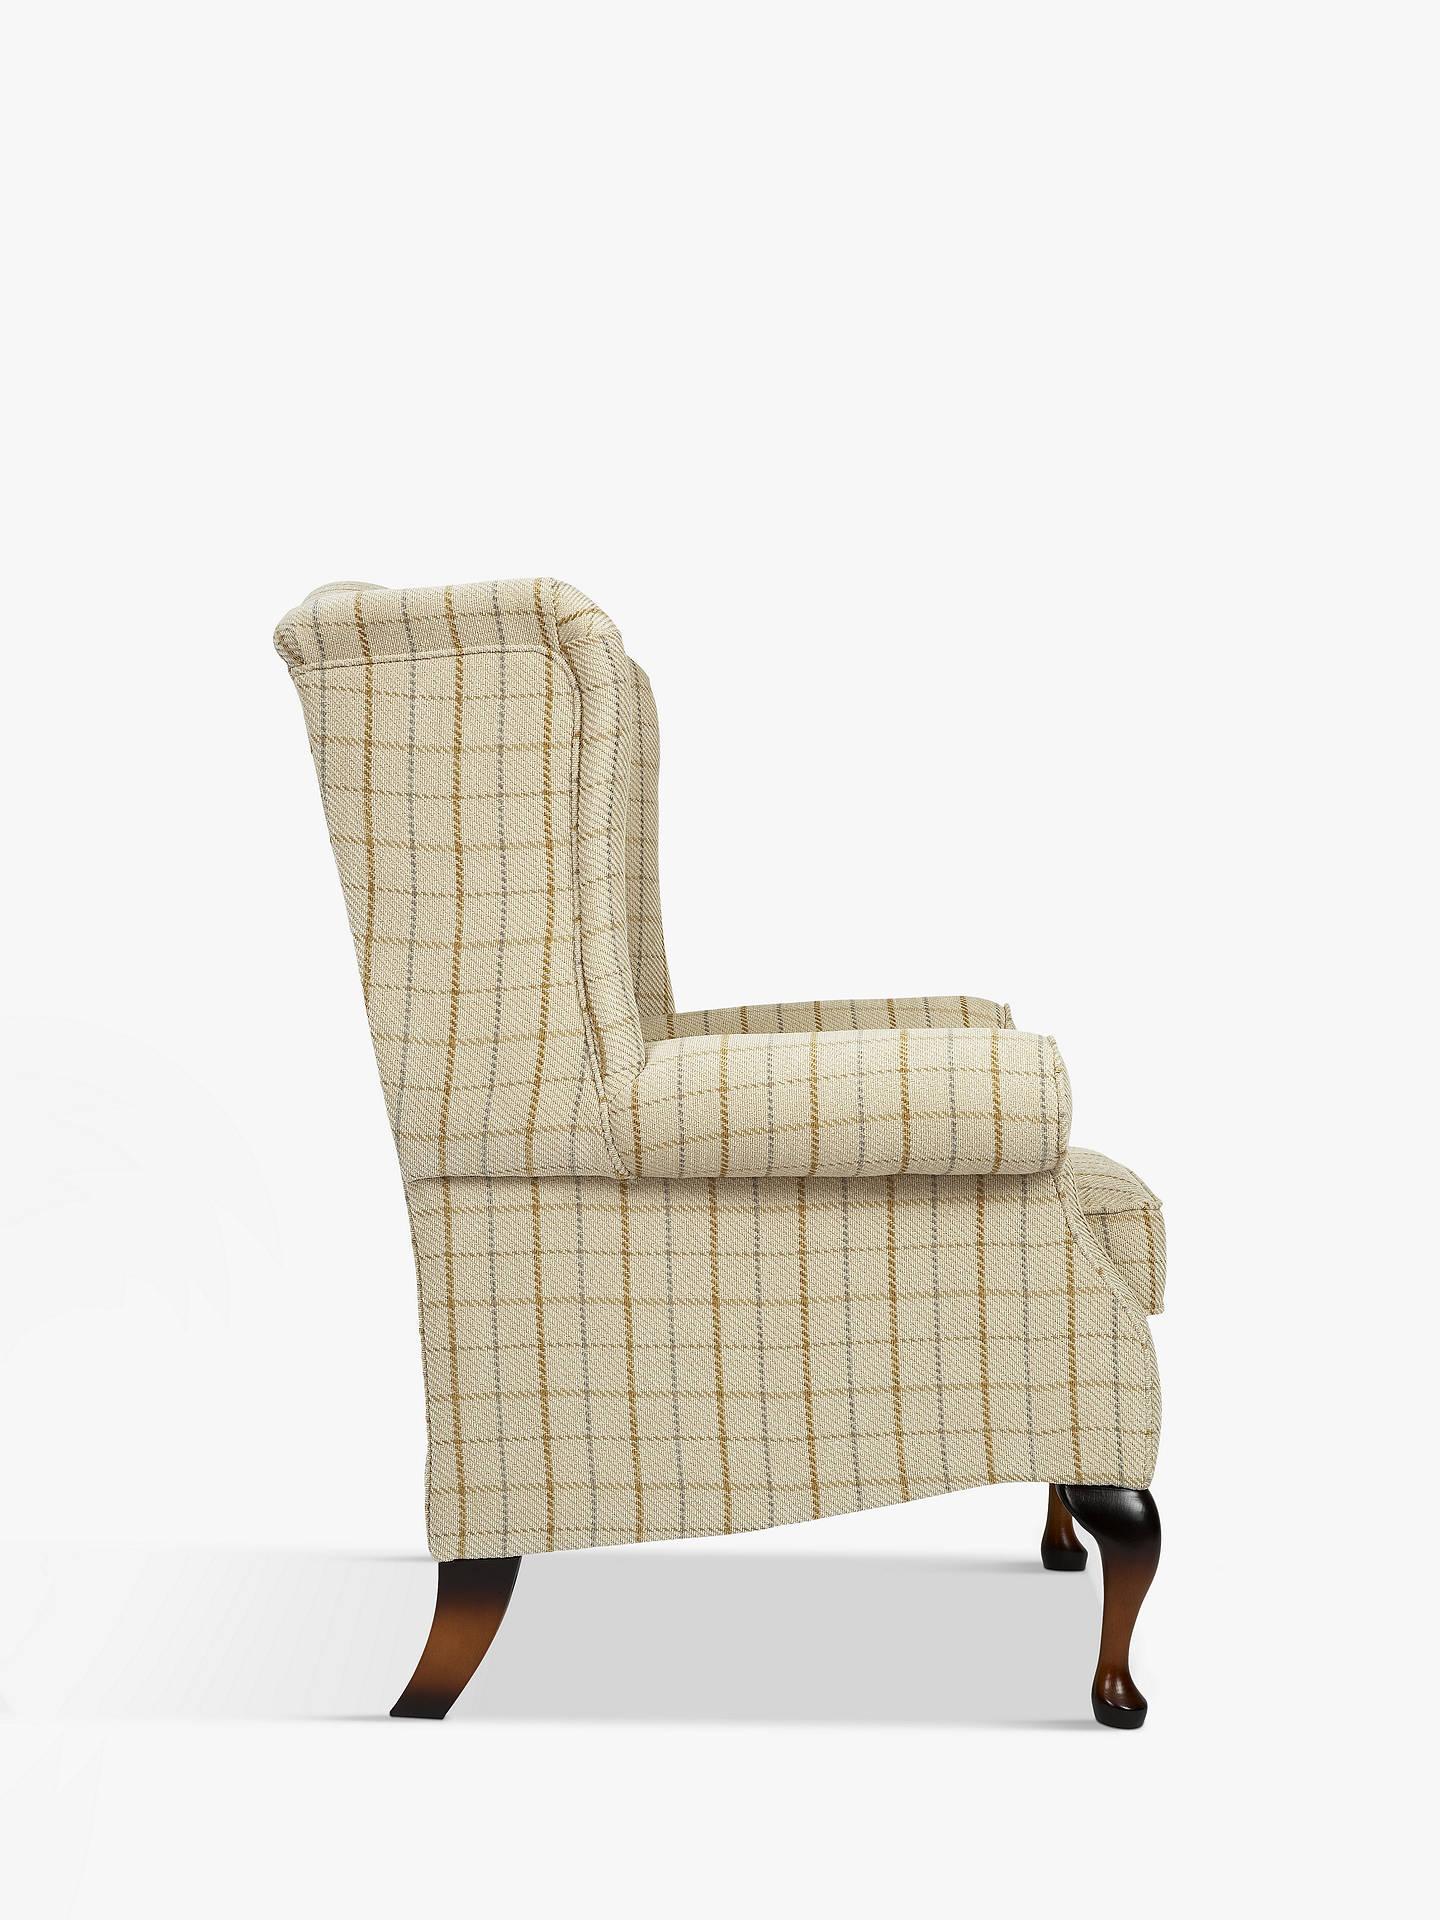 Admirable Parker Knoll Oberon Armchair Sandringham Check Machost Co Dining Chair Design Ideas Machostcouk